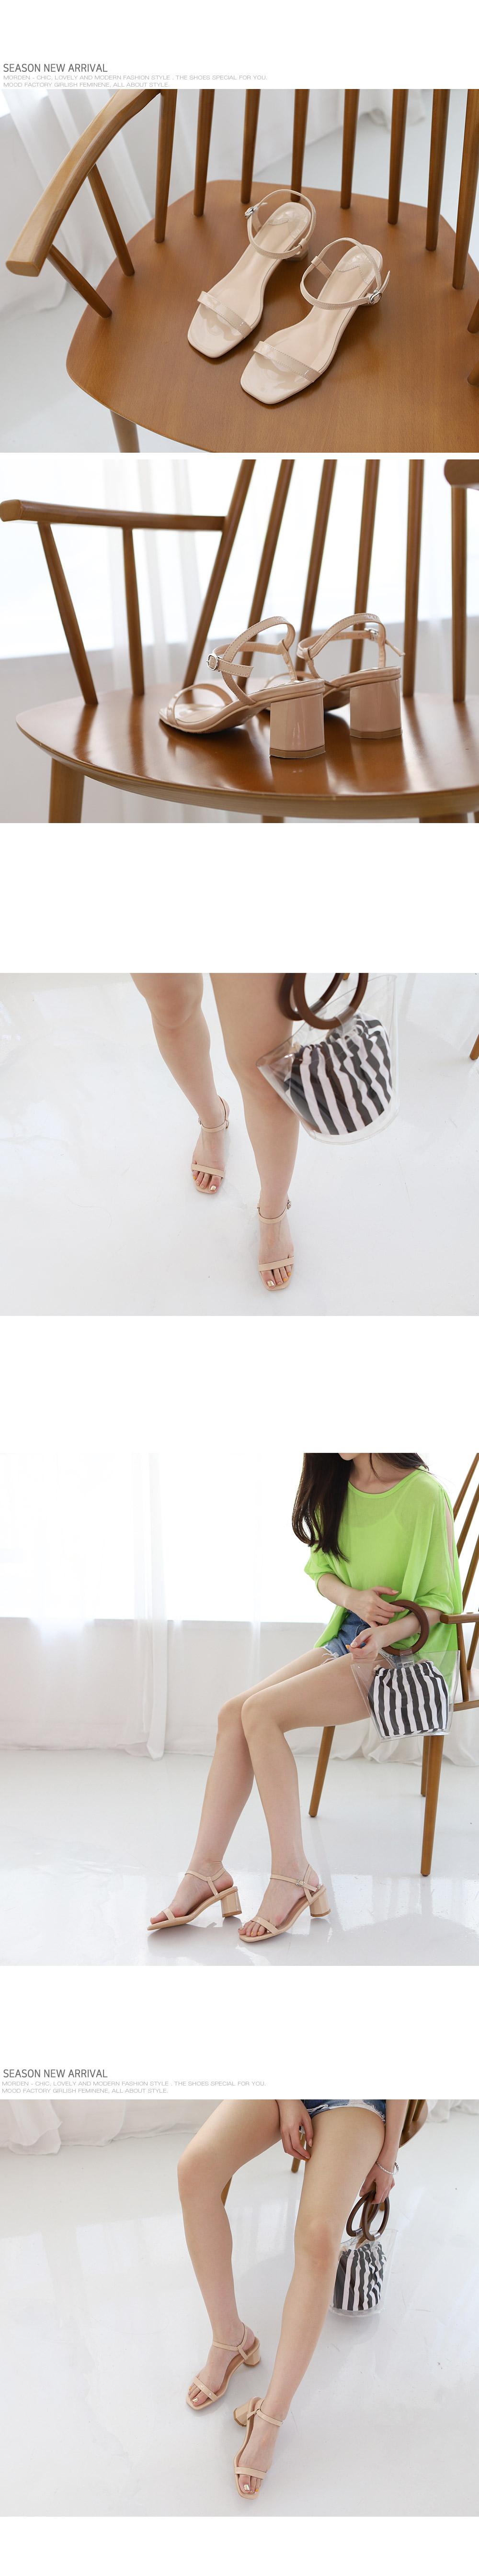 [Handmade] Enamel Buckle Strap Sandals-holiholic.com